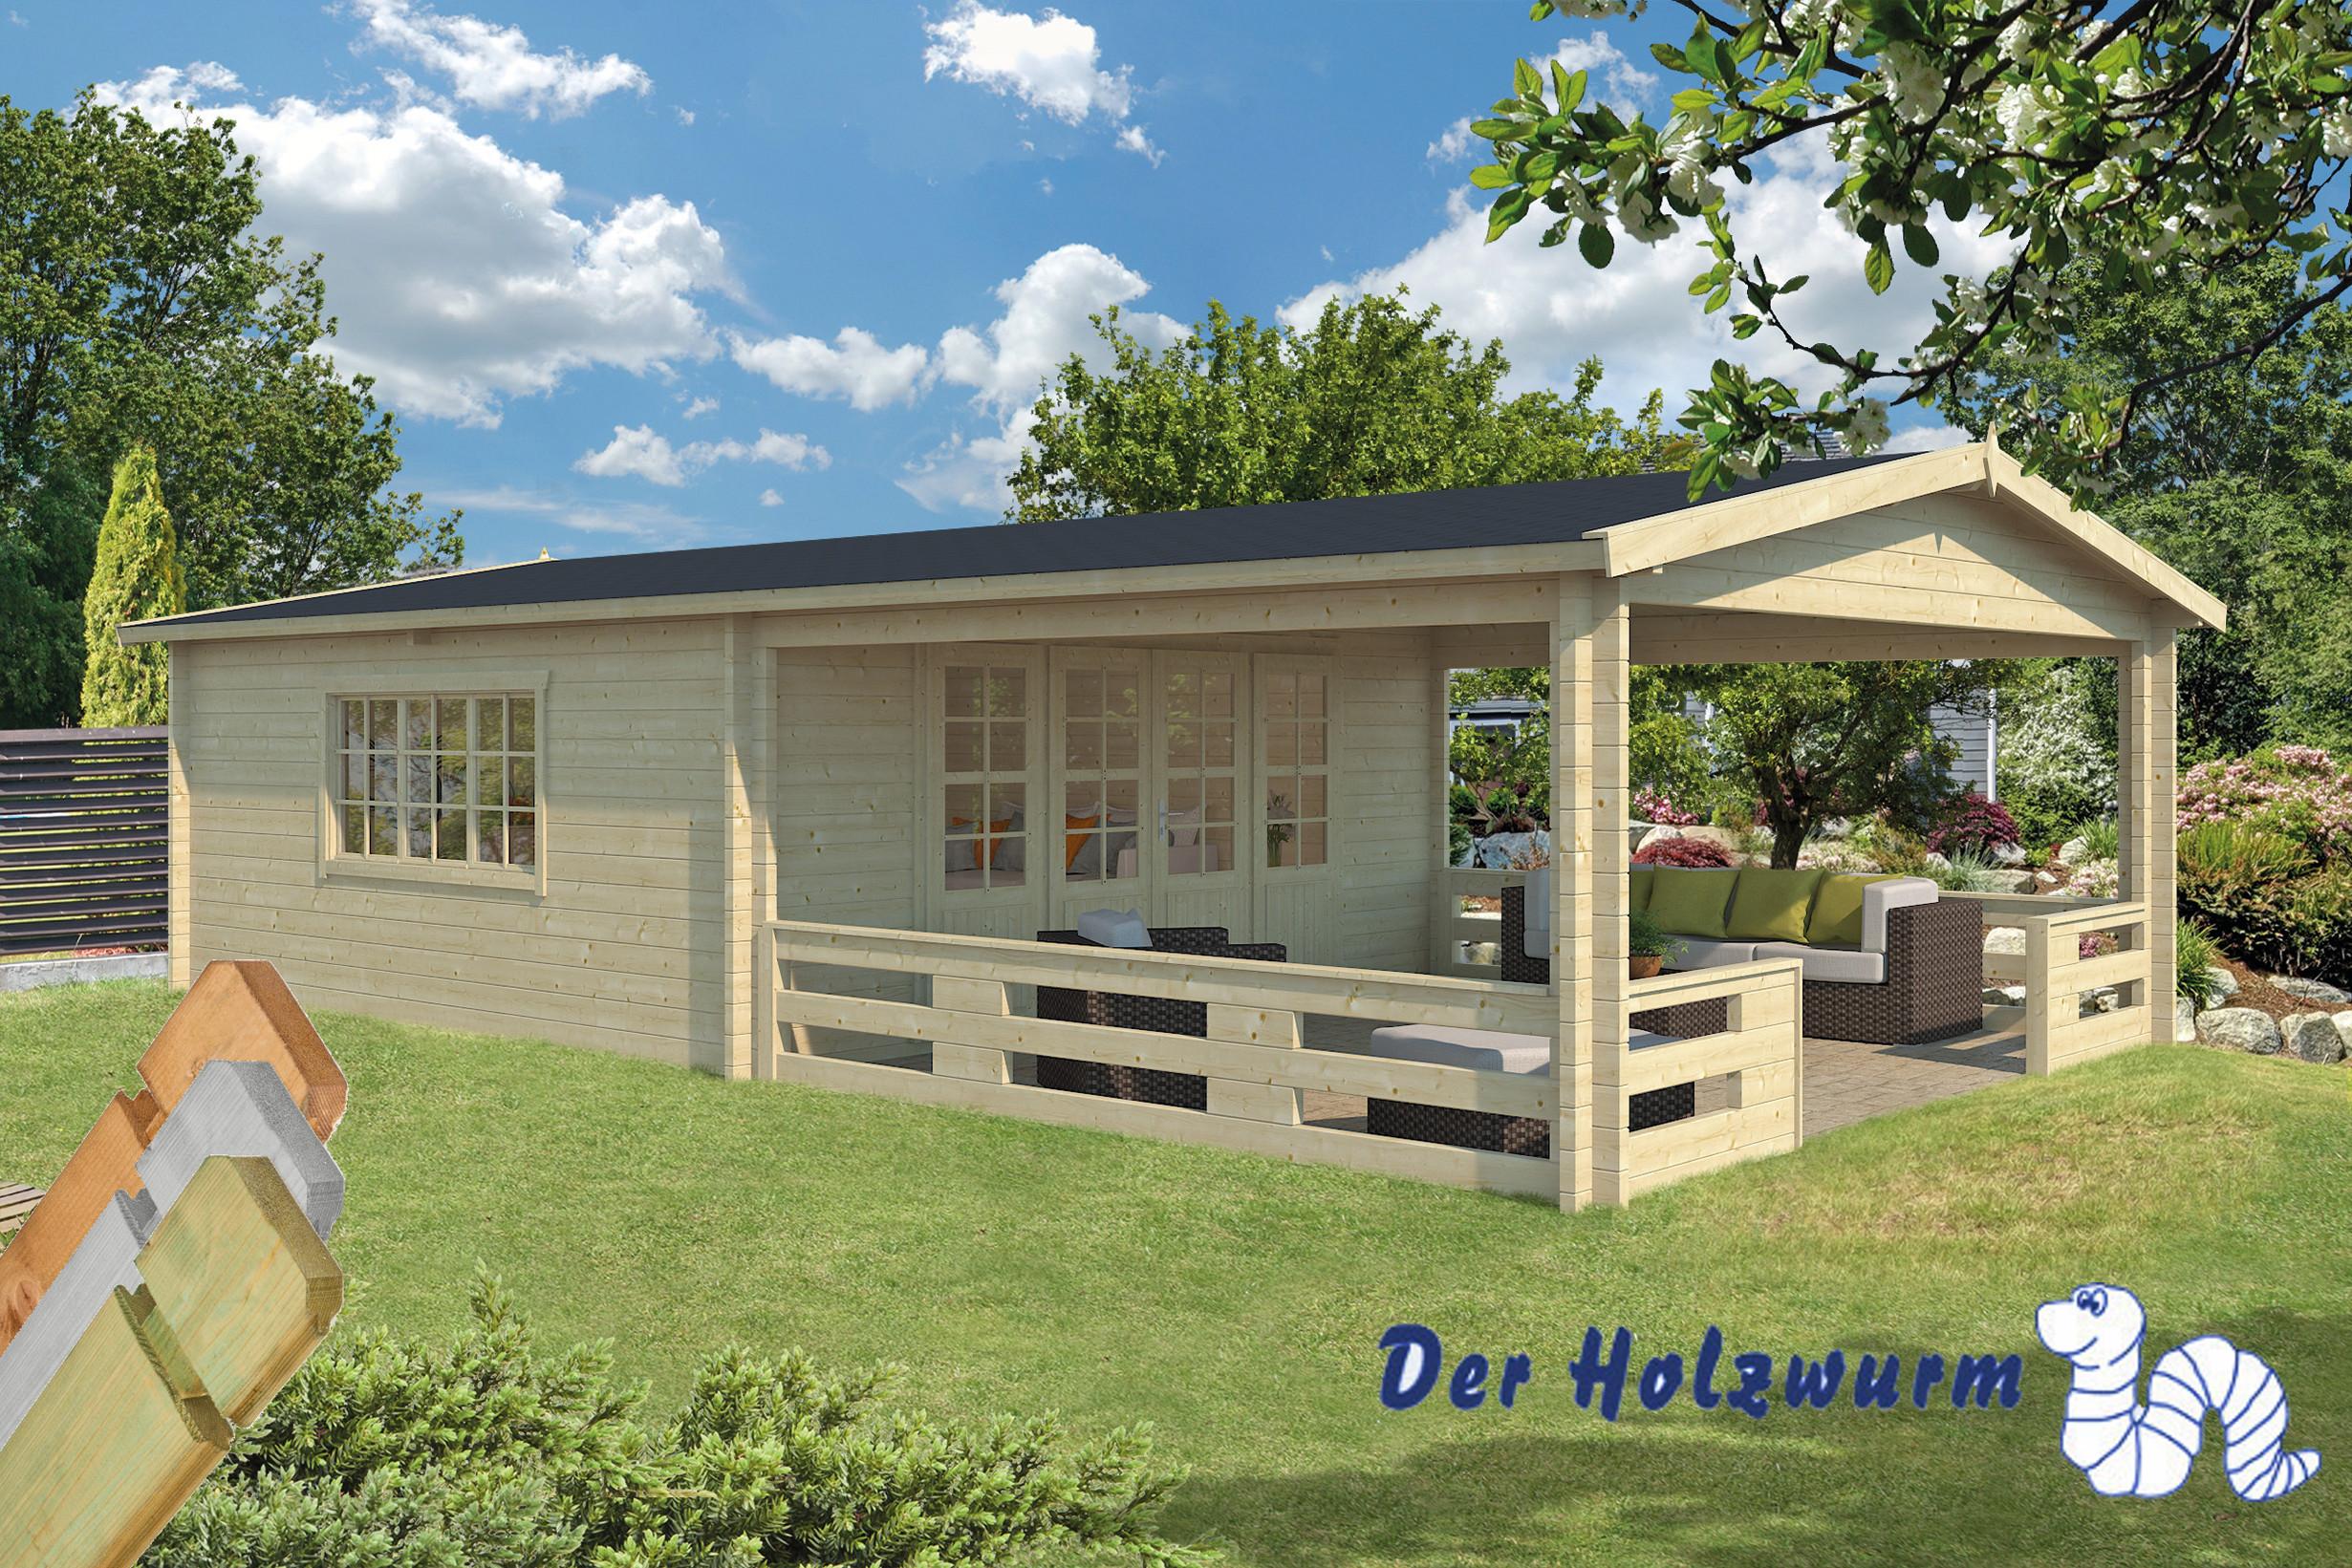 gartenhaus sheffield 58 mm ca 540x963 cm holzwurm obersayn. Black Bedroom Furniture Sets. Home Design Ideas